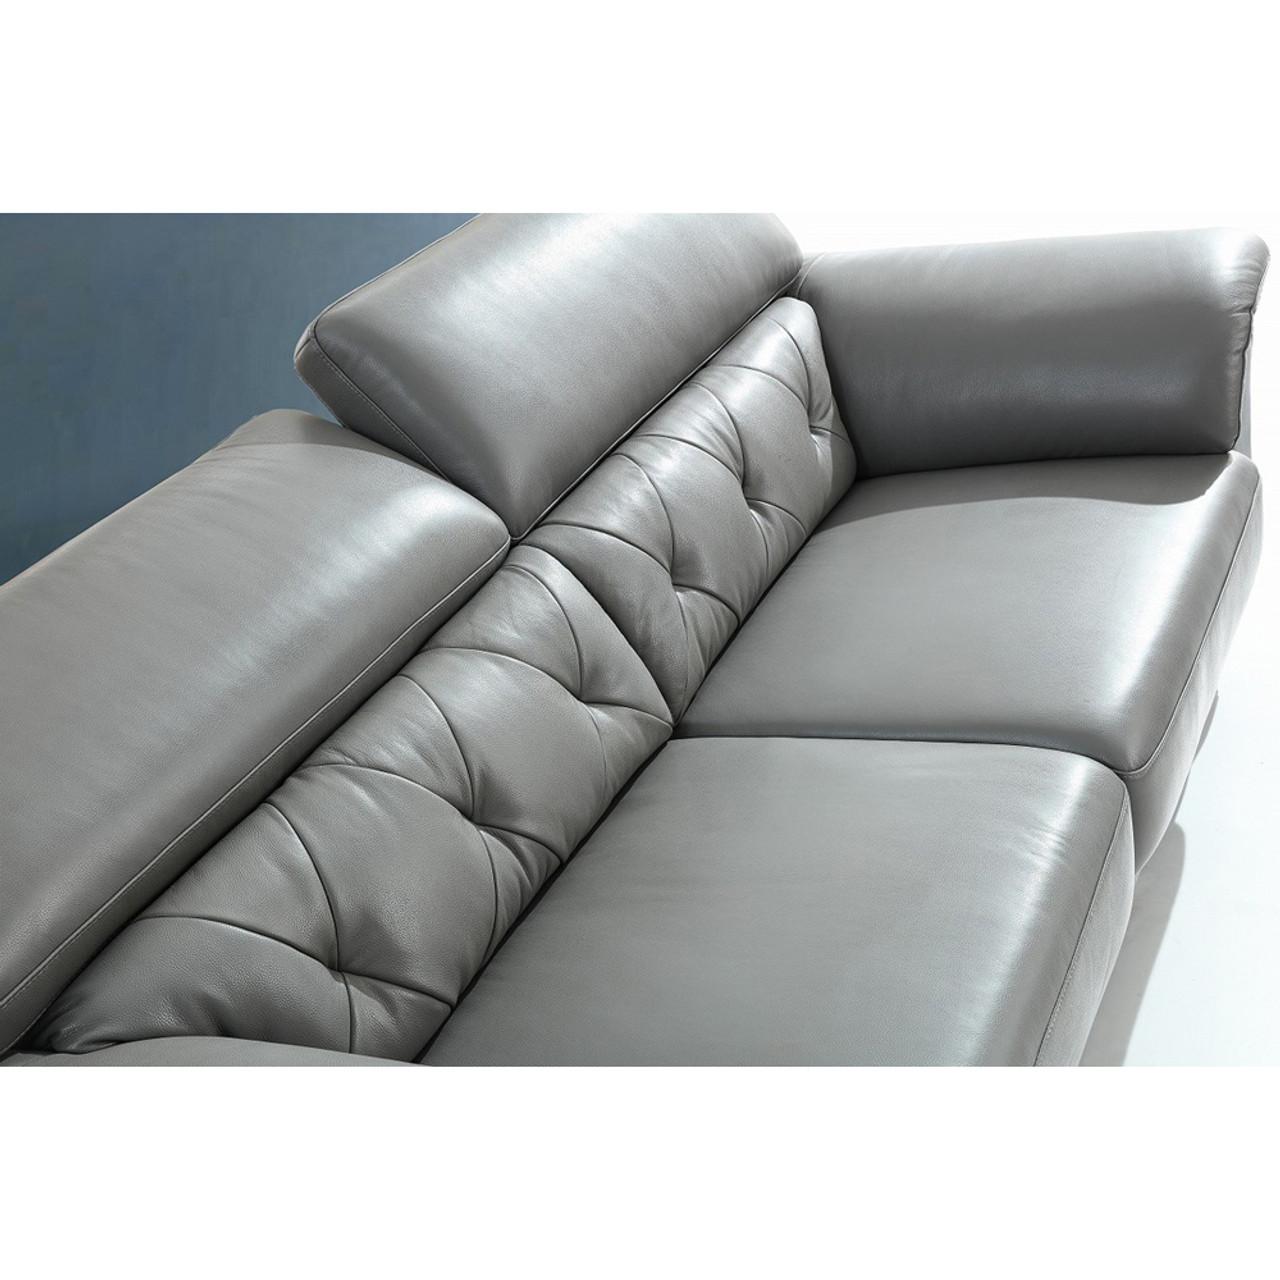 Fabulous Divani Casa Perry Modern Grey Leather Sofa Set Pabps2019 Chair Design Images Pabps2019Com